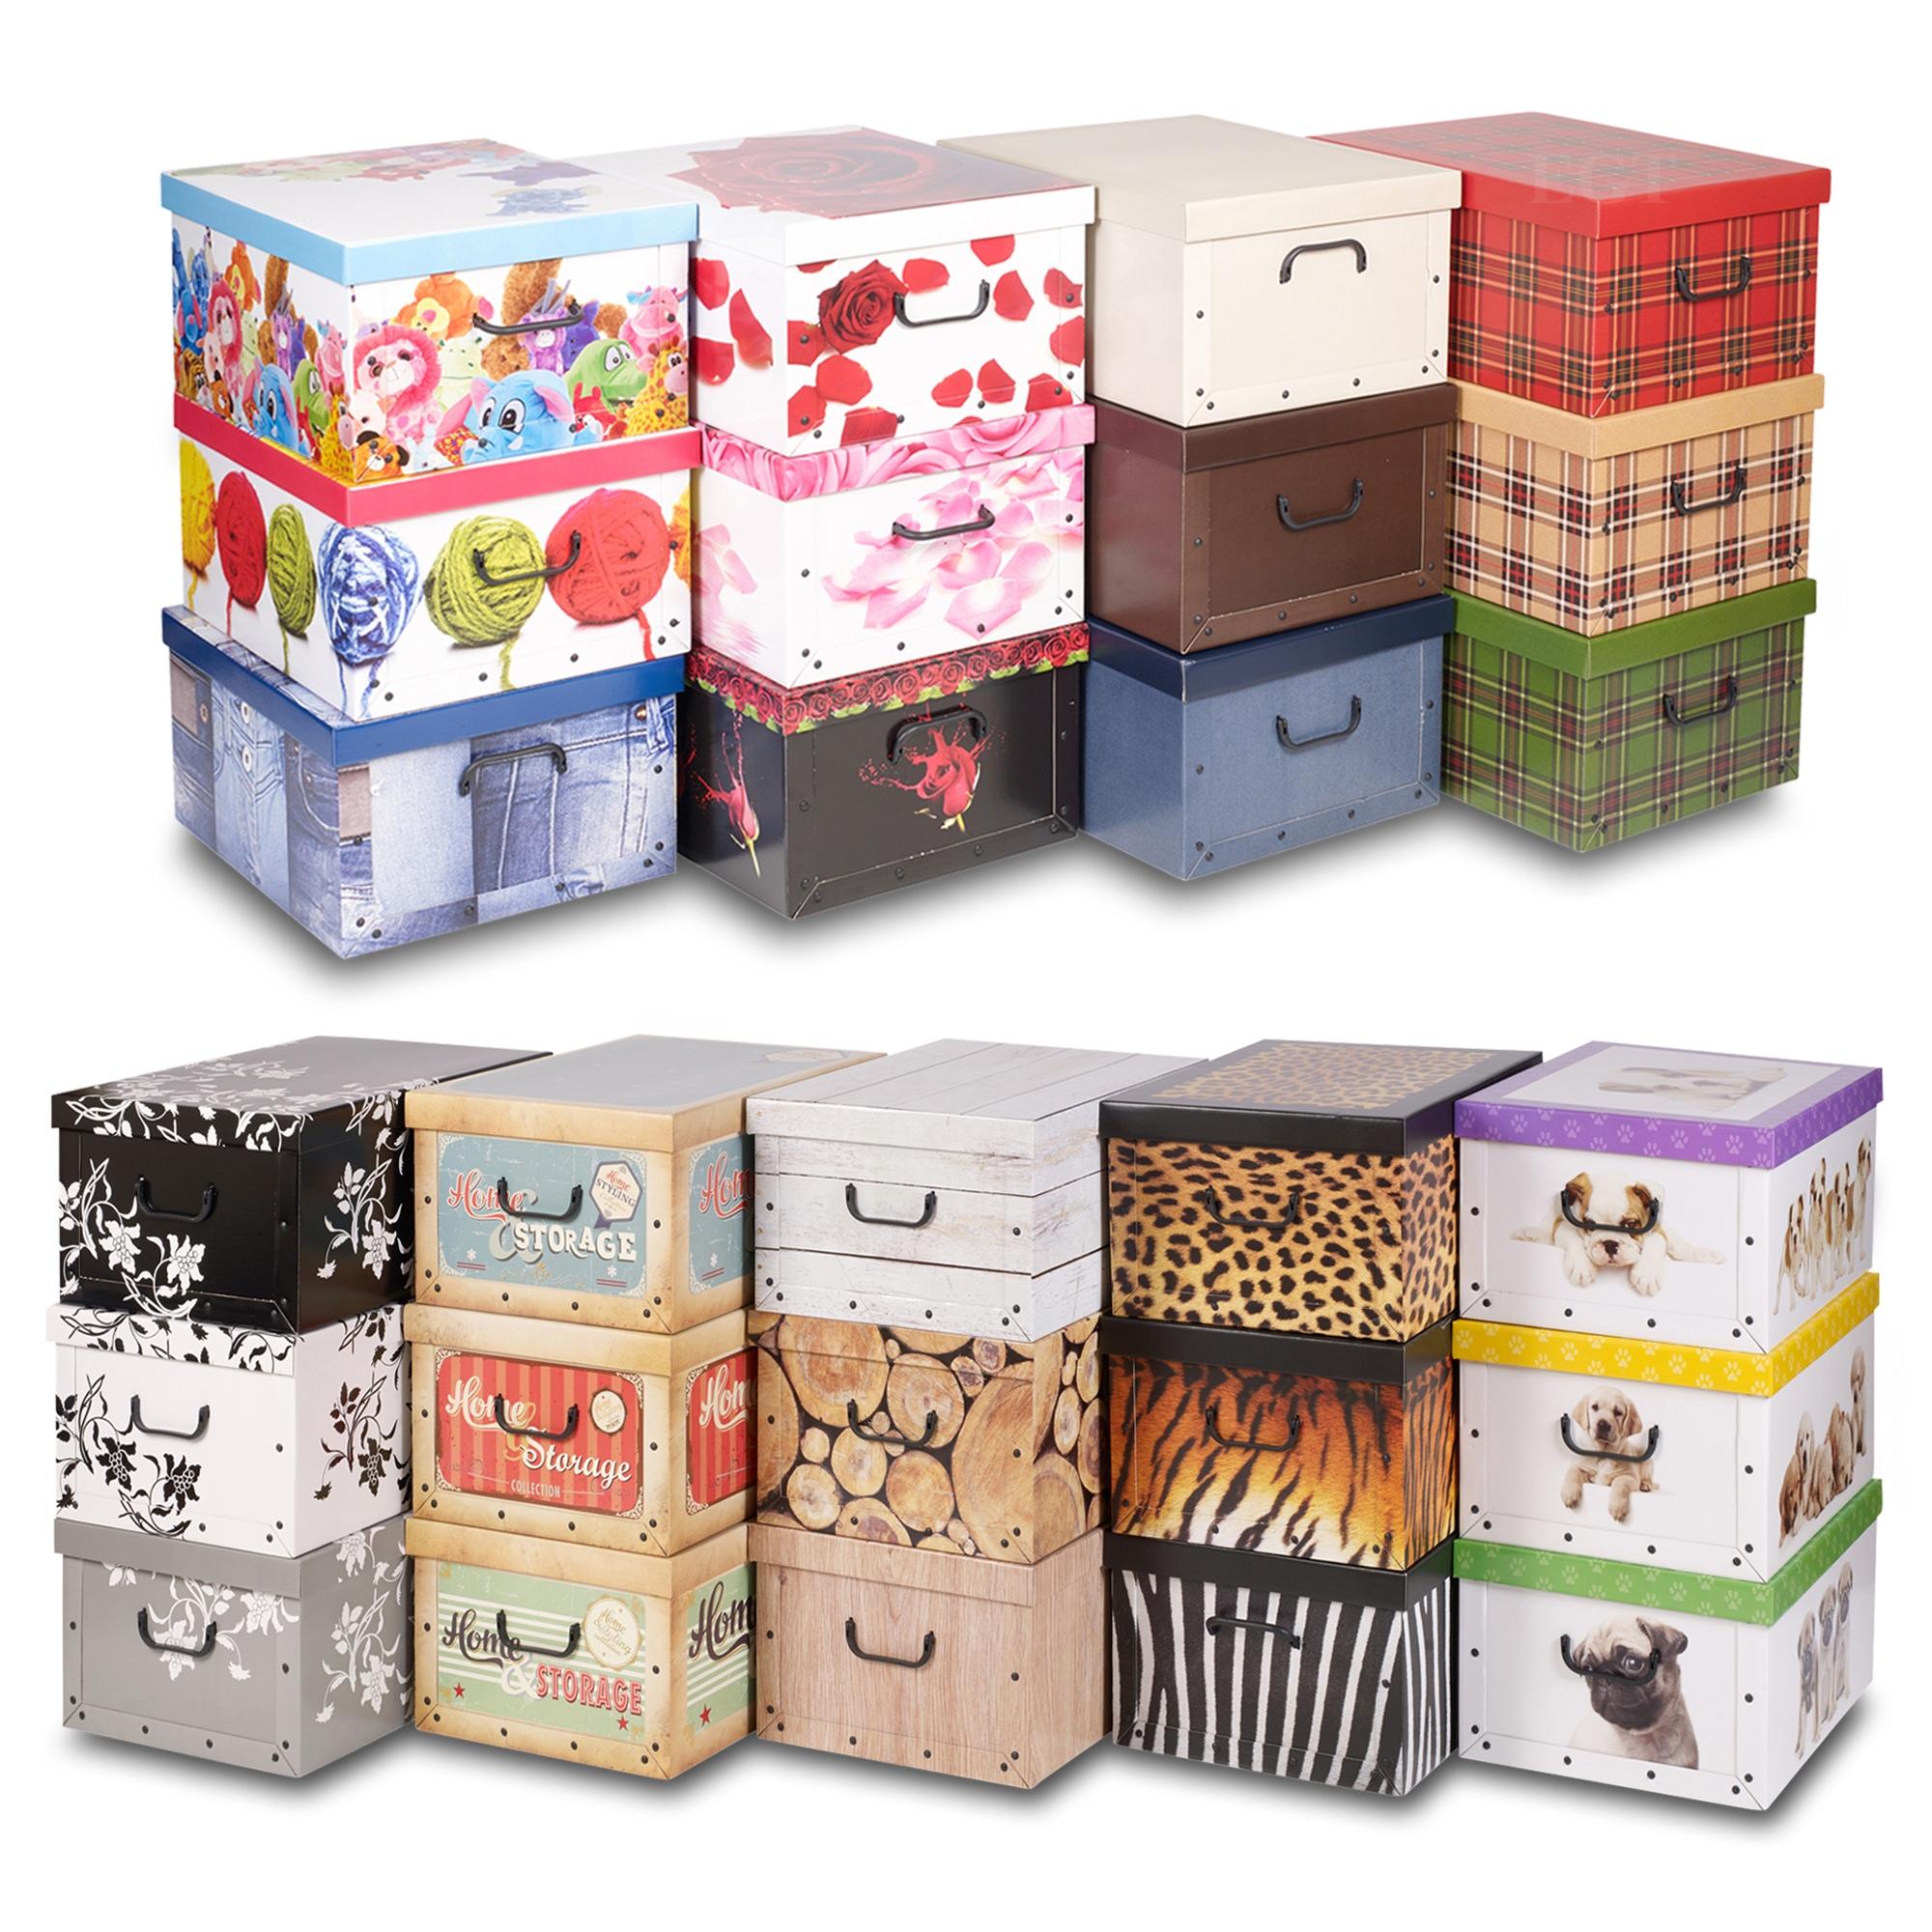 3 underbed collapsible cardboard storage boxes lightweight with lids handles ebay. Black Bedroom Furniture Sets. Home Design Ideas